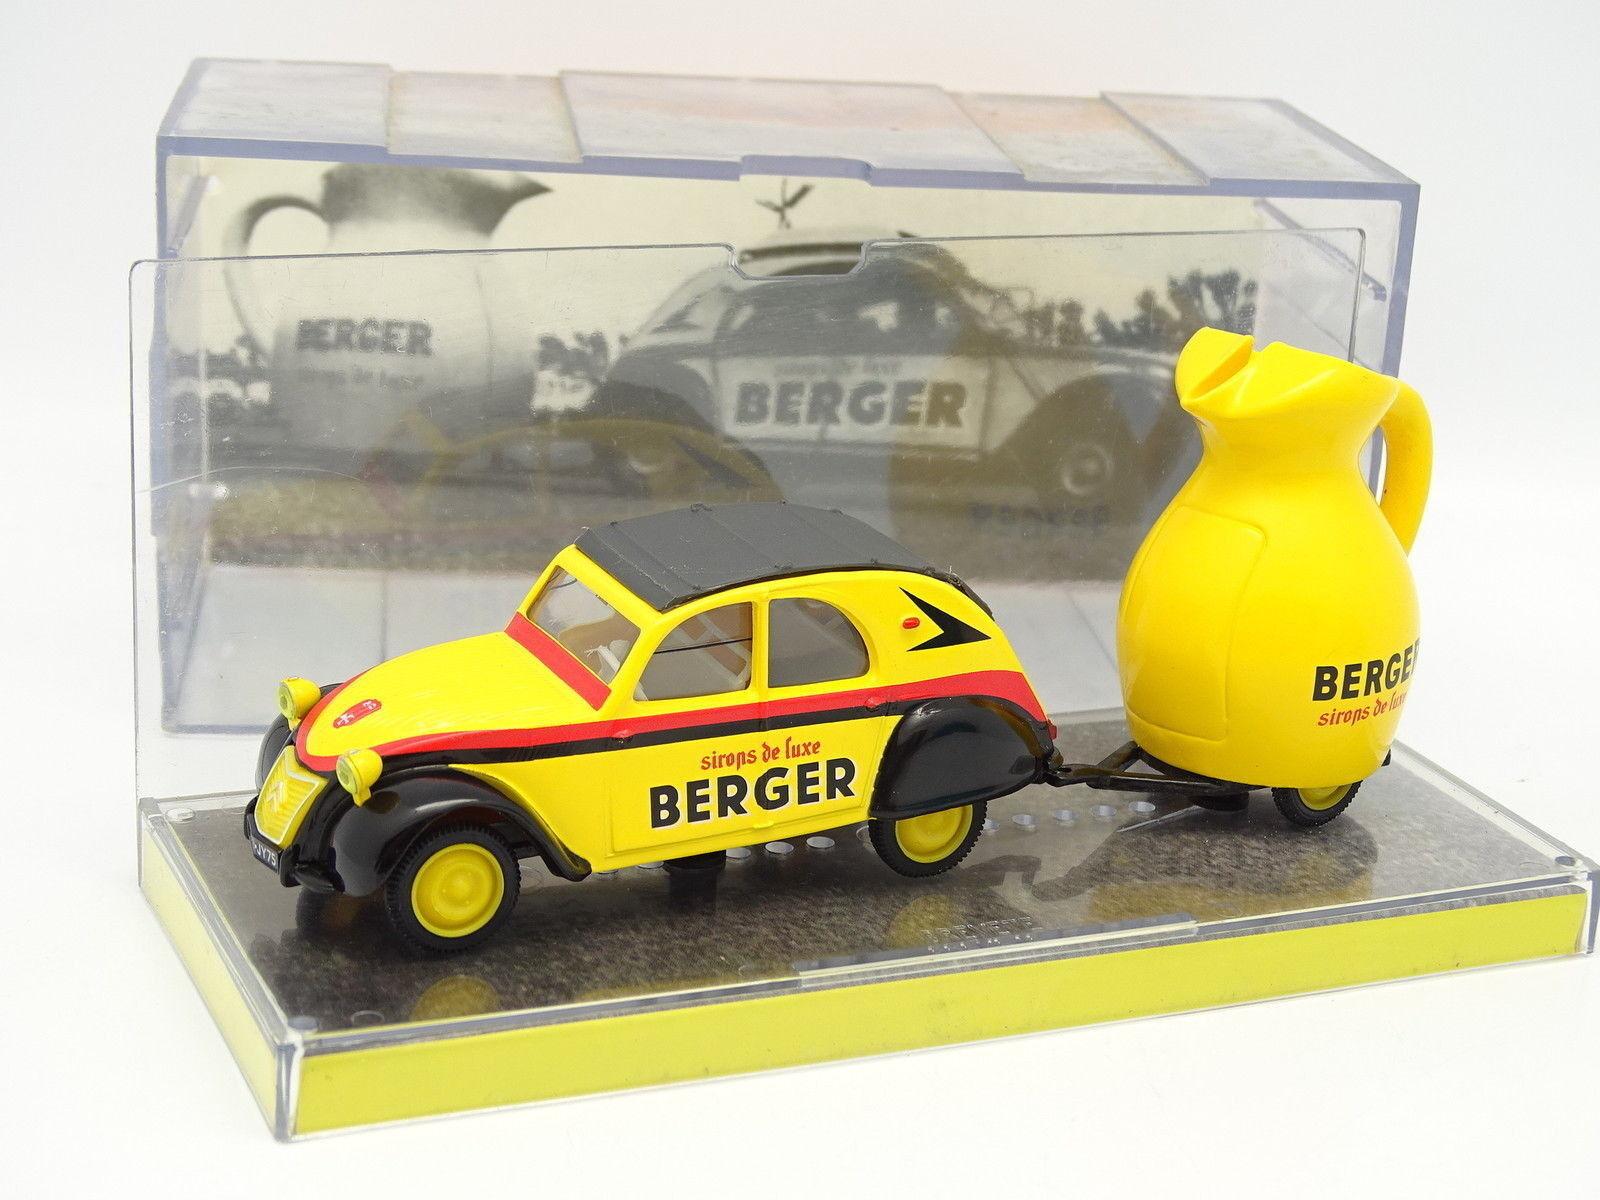 Norev 1 43 - - - Citroen 2CV Berger + Remorque Carafe Tour de France d90846